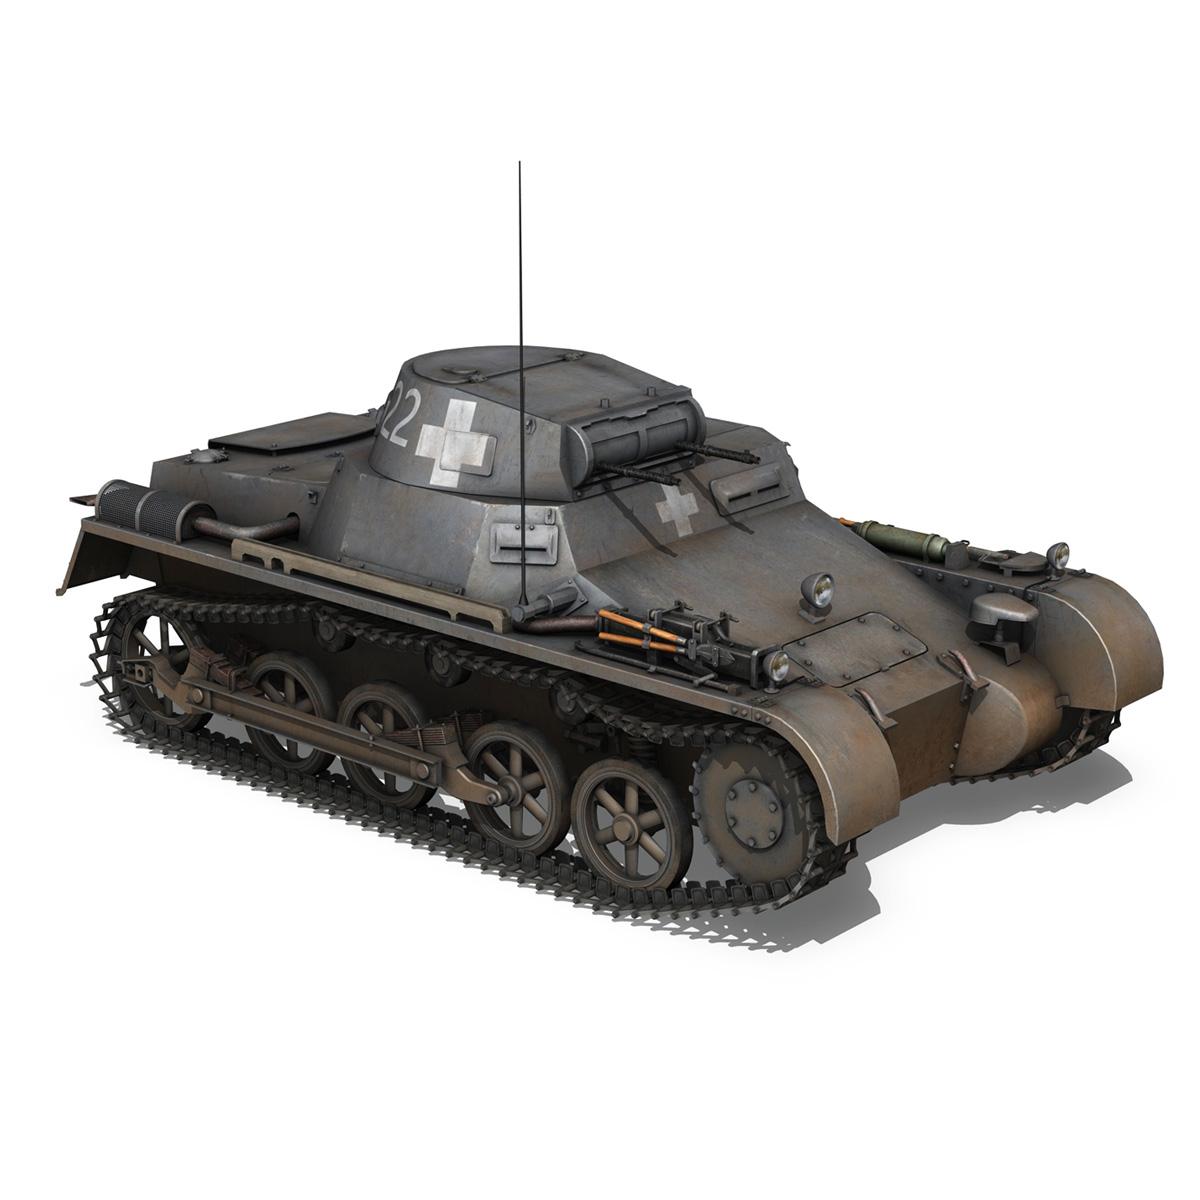 pzkpfw 1 - Panzer 1 - ausf. a - 22 3d modell 3ds fbx c4d lwo obj 186931